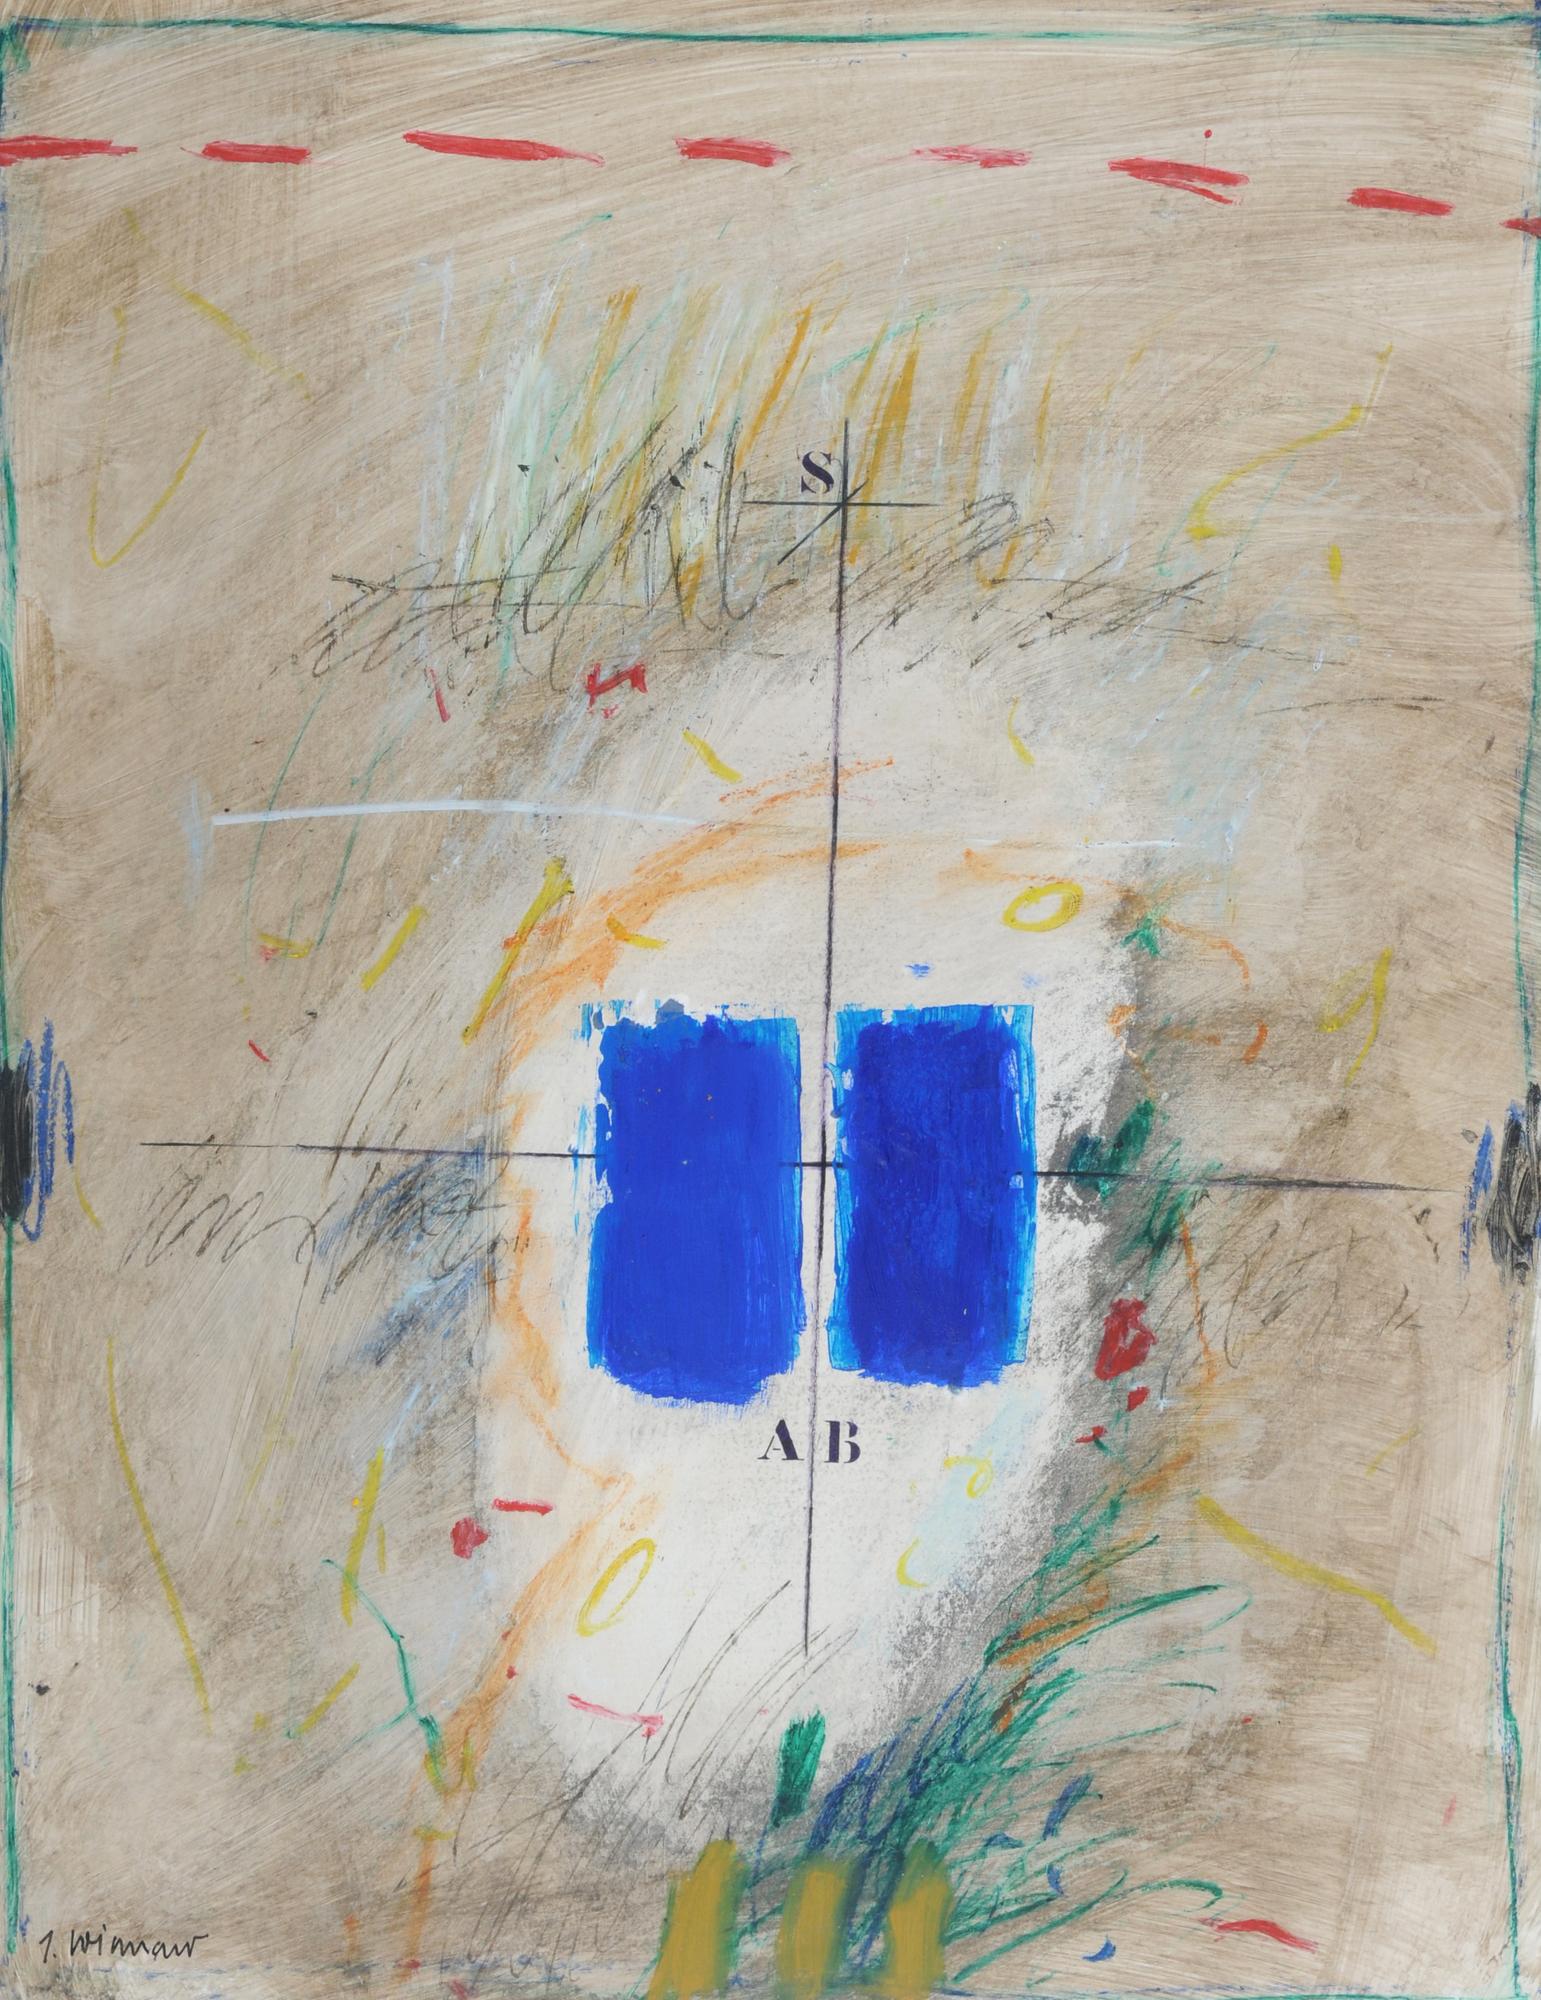 Coignard James, Composition 59 356